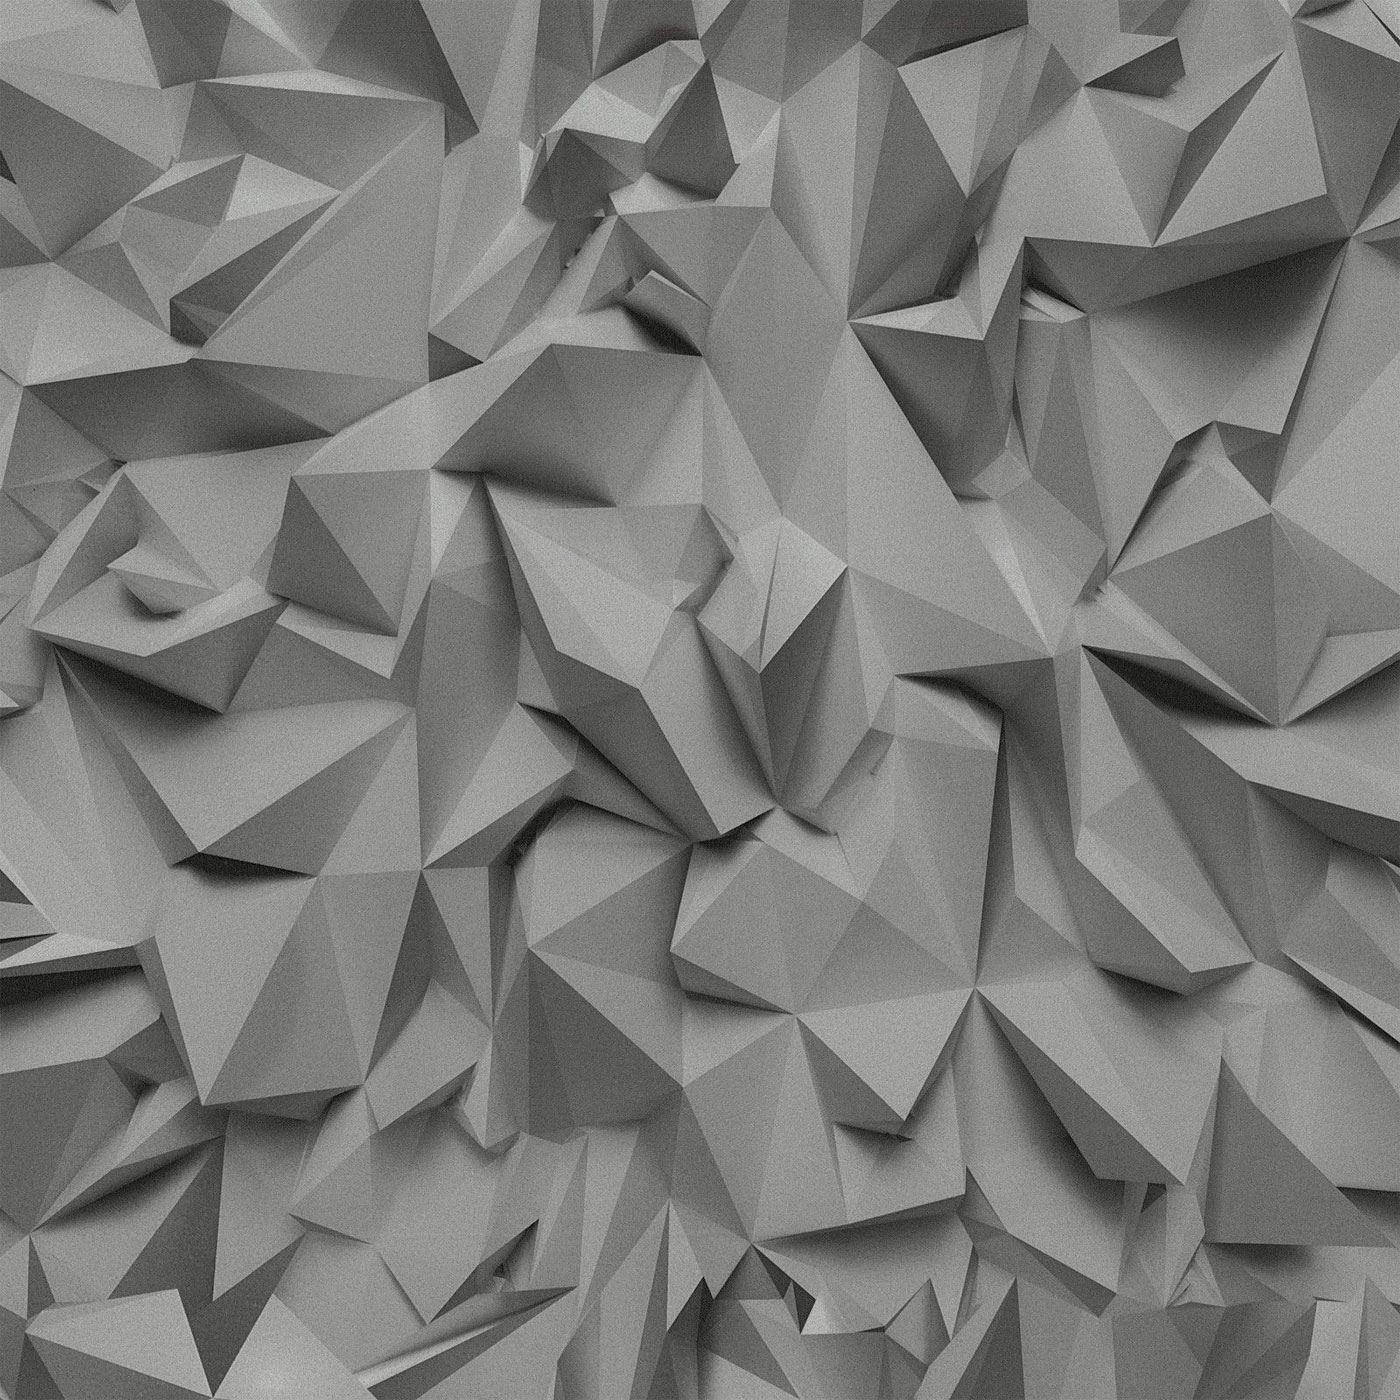 Grey Silver 3d Effect Geometric Triangles Wallpaper Metallic Vinyl Paste Wall 4000278209743 Ebay